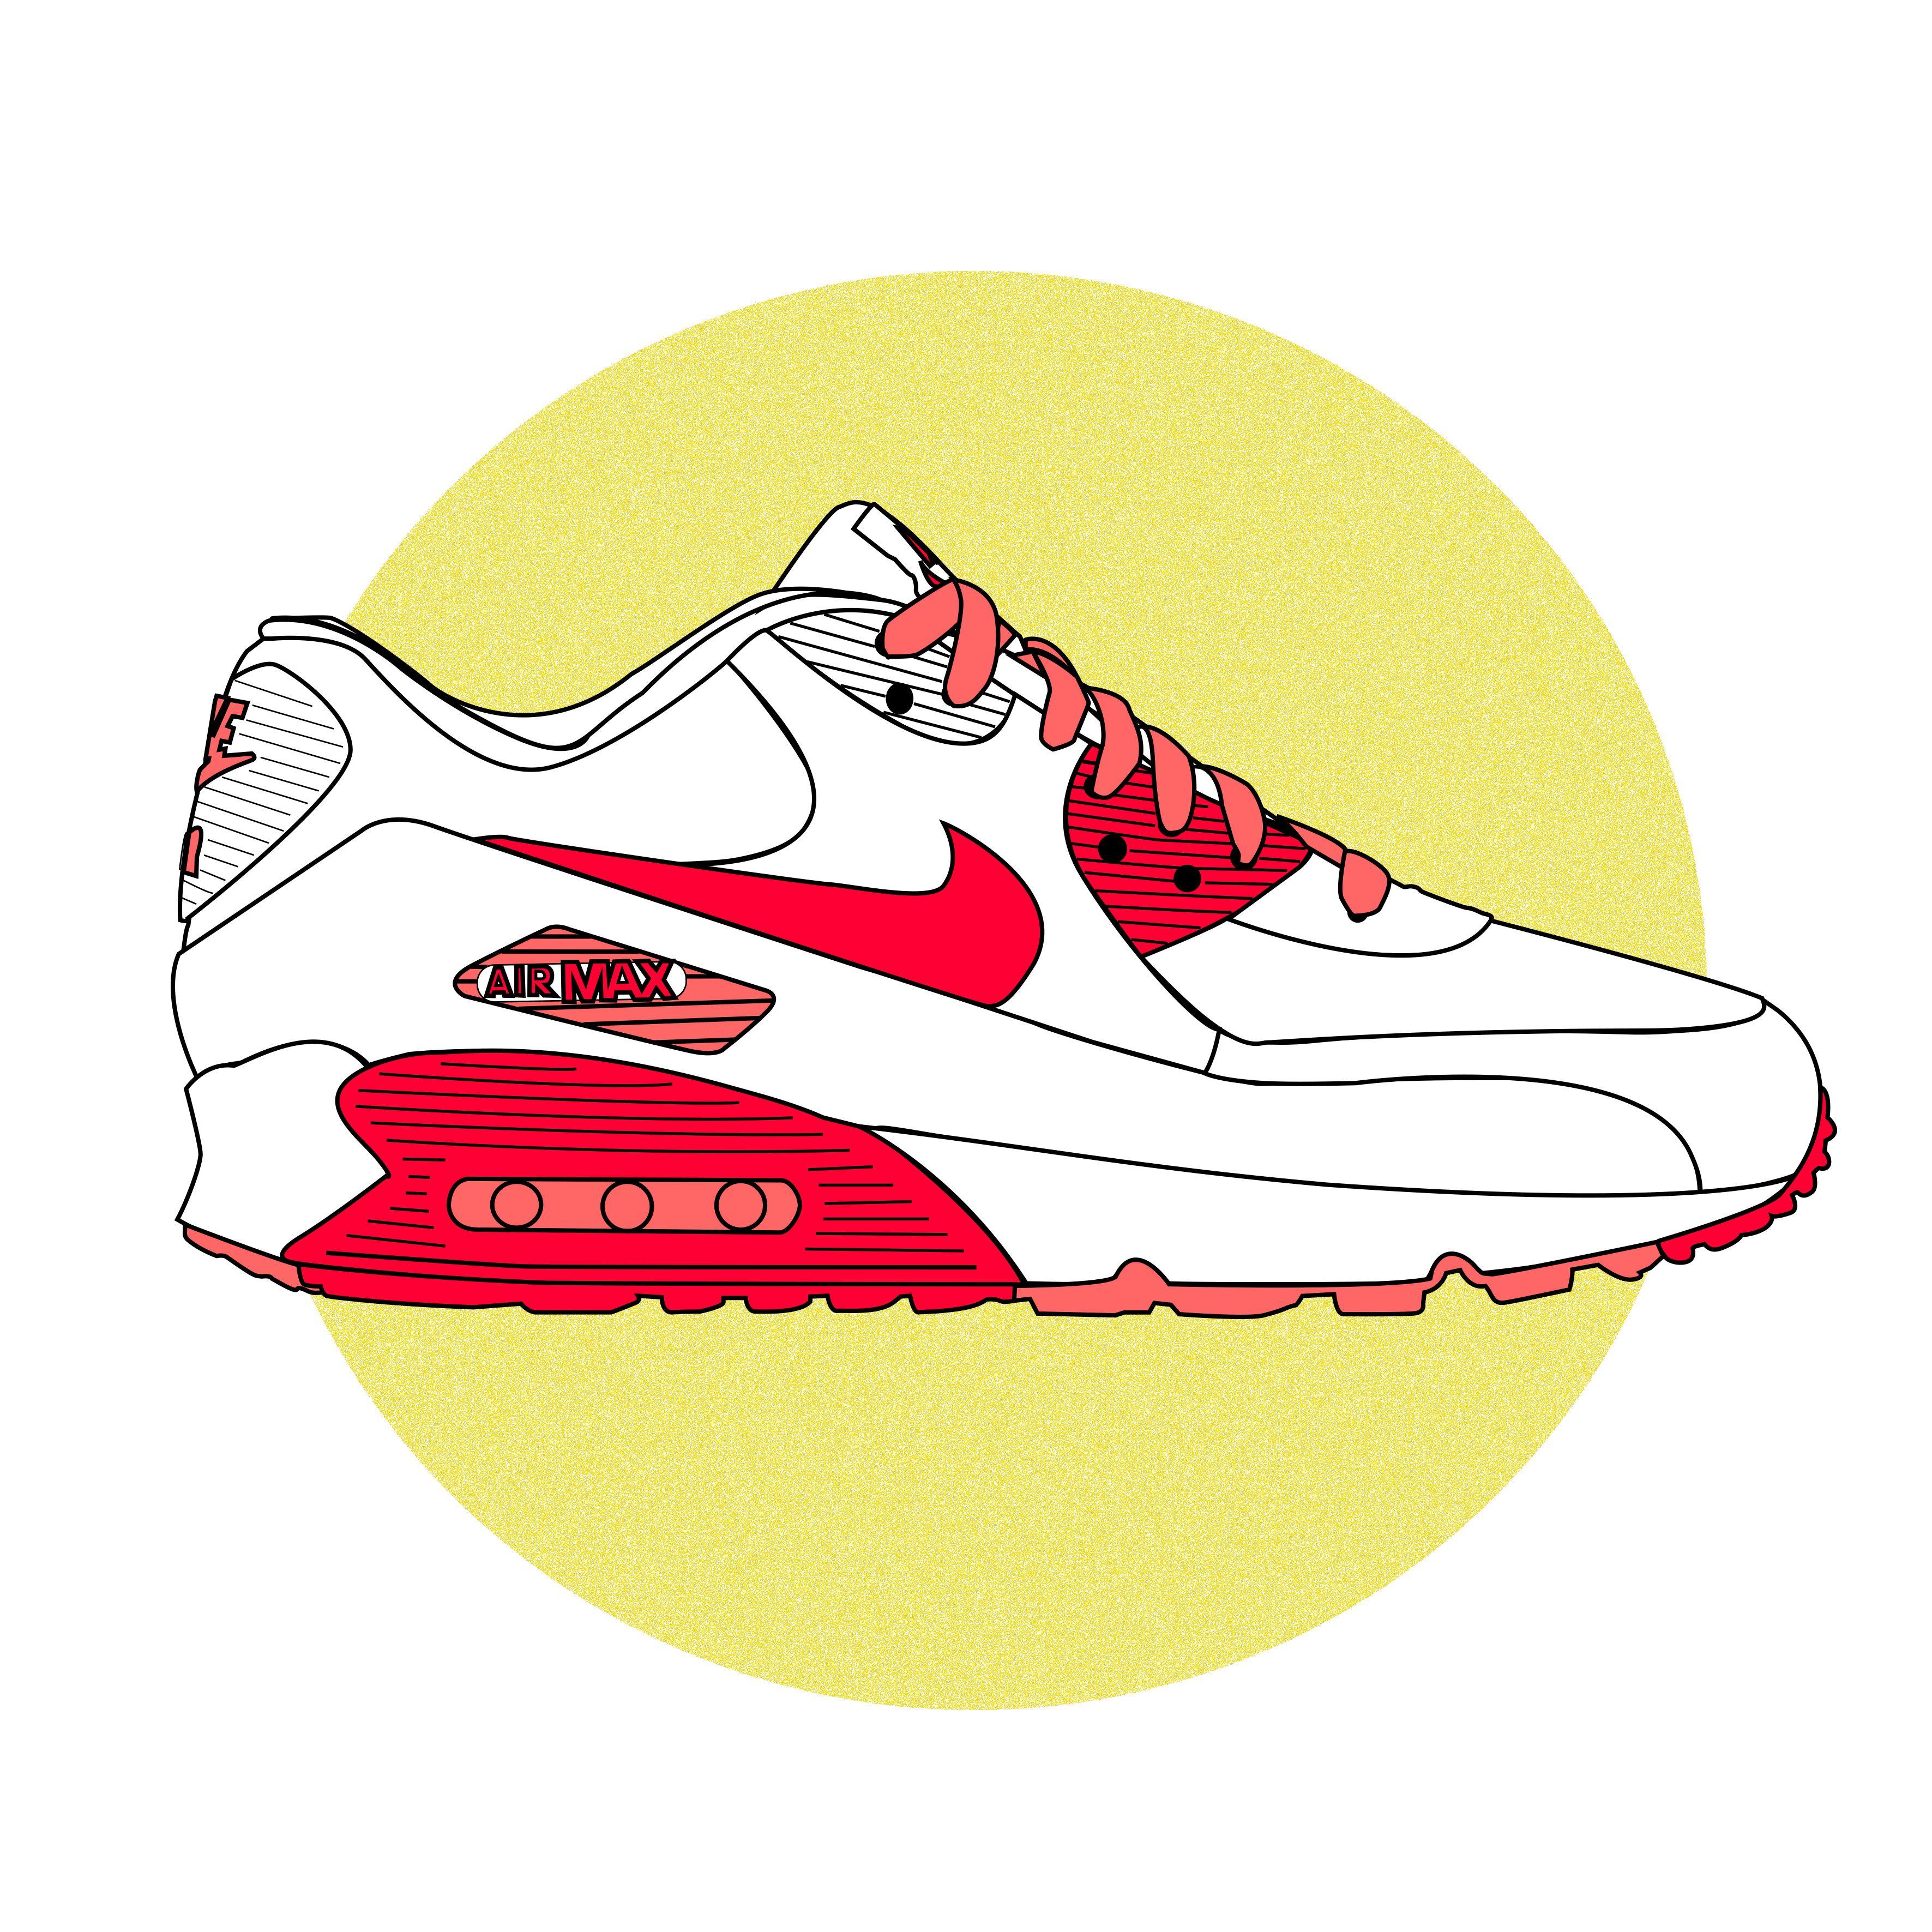 Nike AirMAX 90 #Strawberry Daniel Medina 2013 #Illustration #Nike #AirMAX90